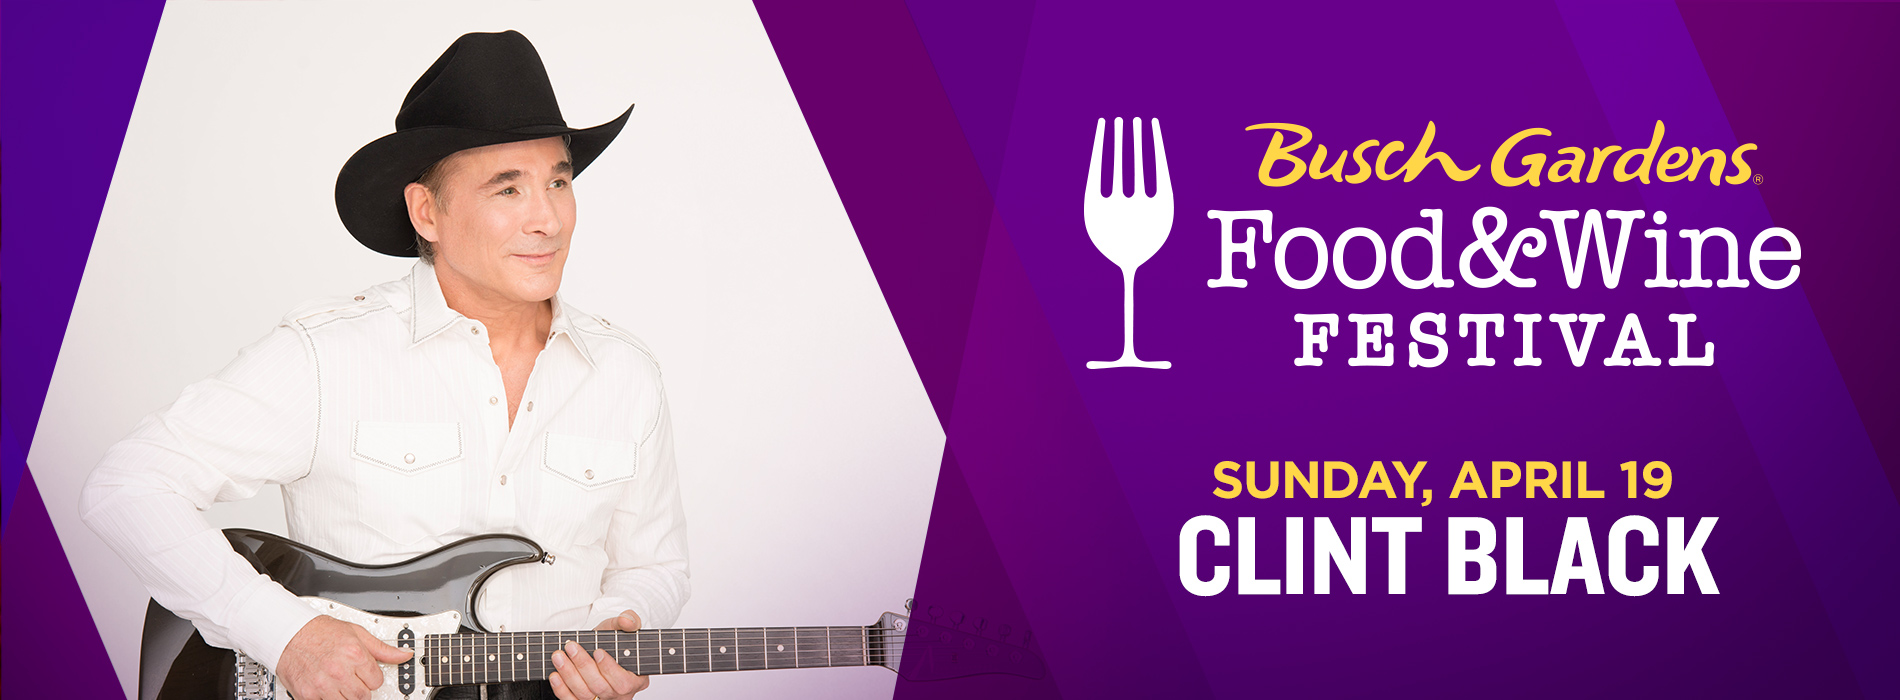 Clint Black at Busch Gardens on Sunday, April 19